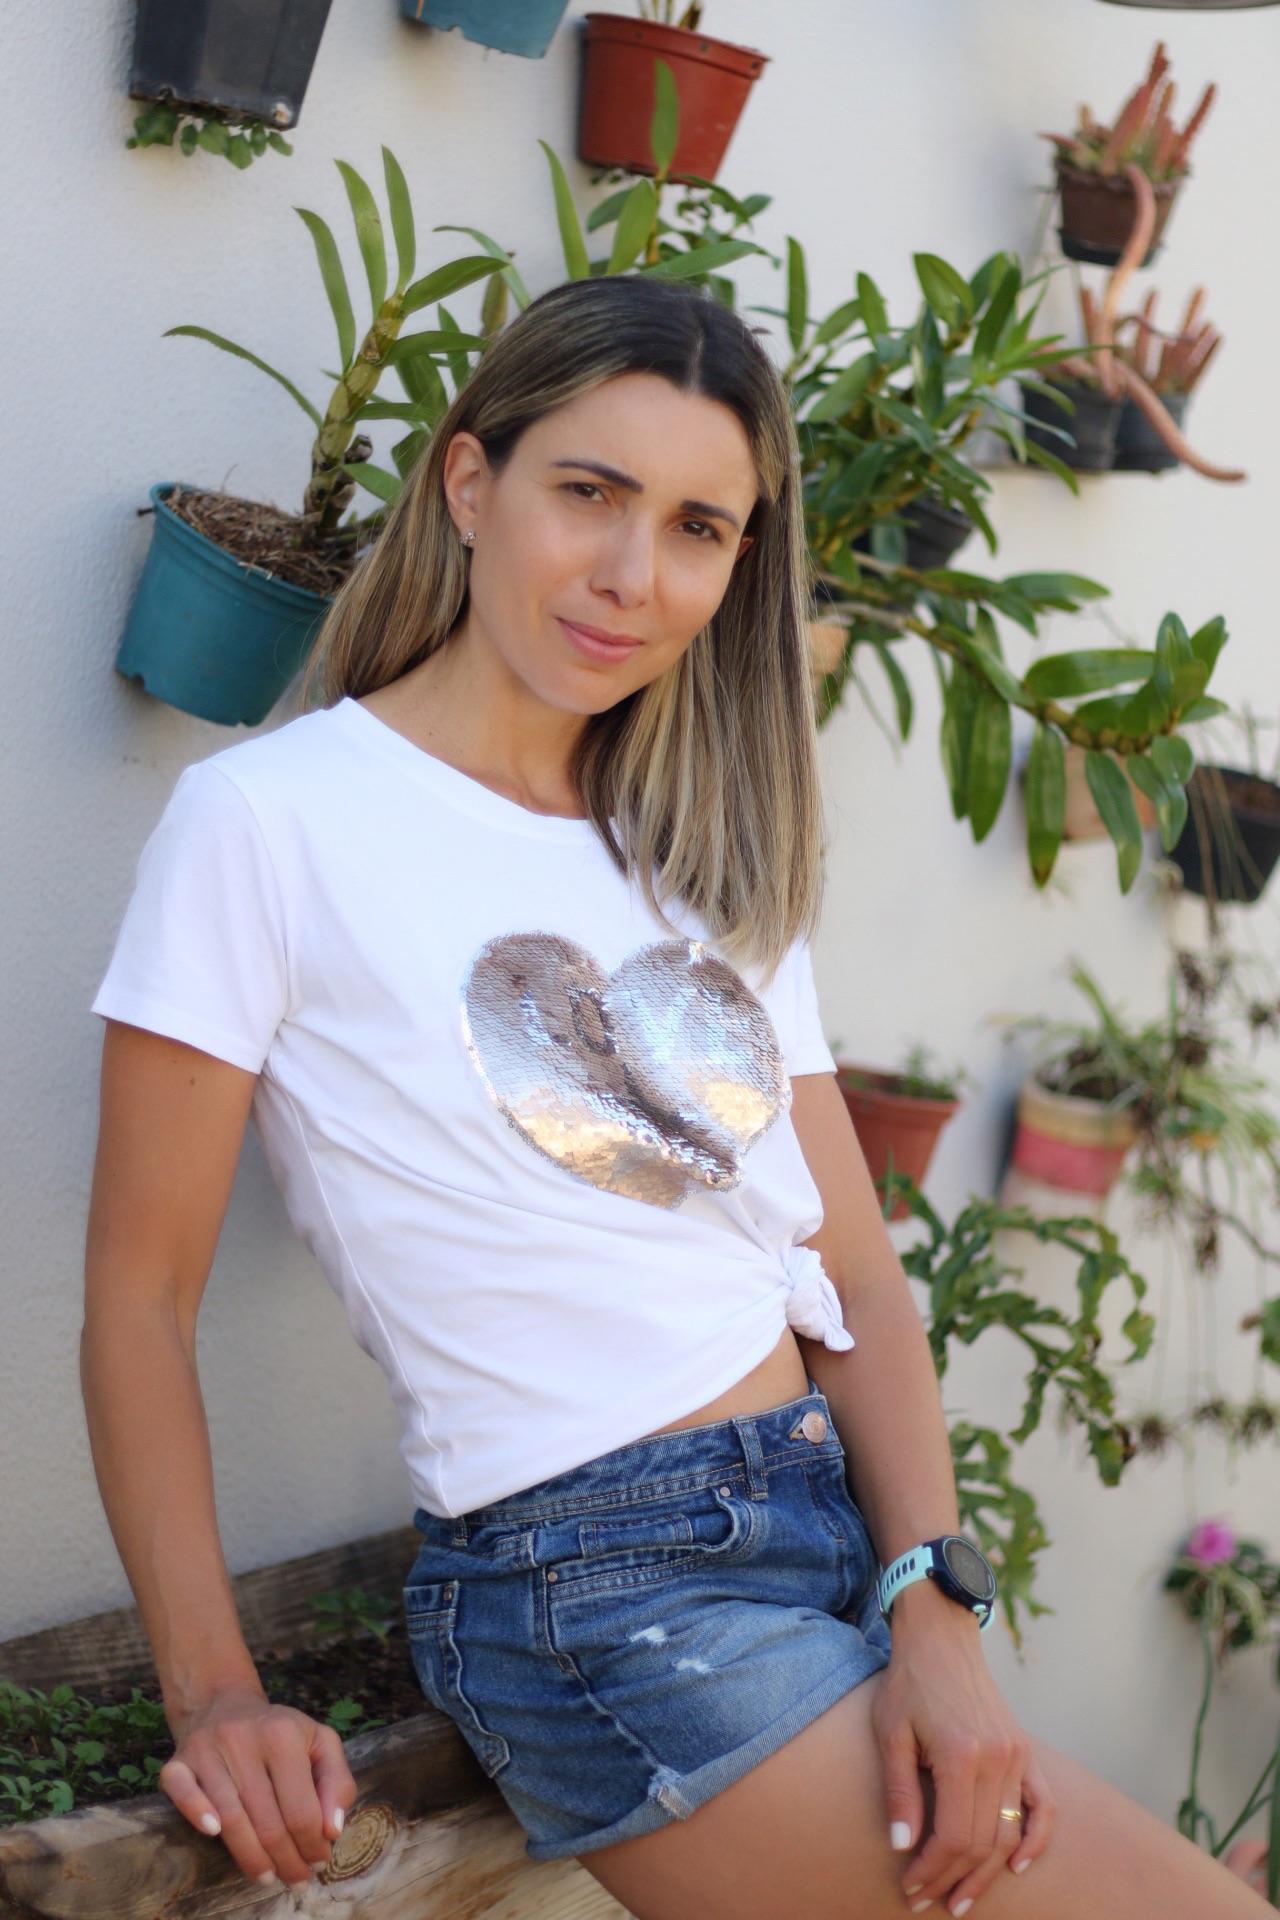 Digital influencer, Kerllen Bittencourt Rego, is the finalist of the World Bloggers Awards